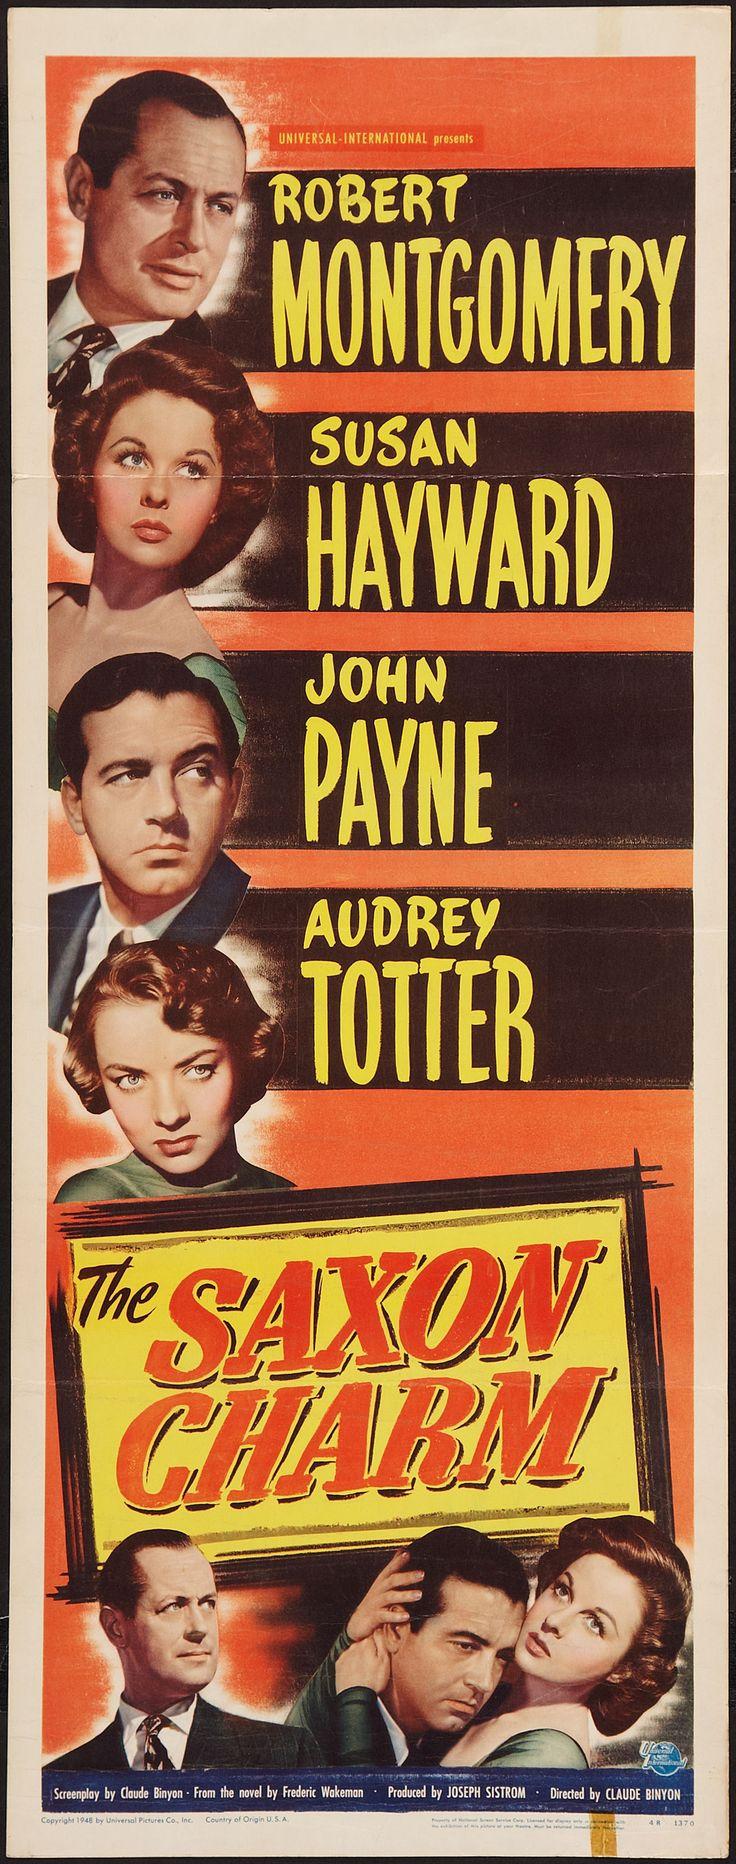 The Saxon Charm (1948) Stars: Robert Montgomery, Susan Hayward, John Payne, Audrey Totter, Harry Morgan, Chill Wills ~ Director: Claude Binyon